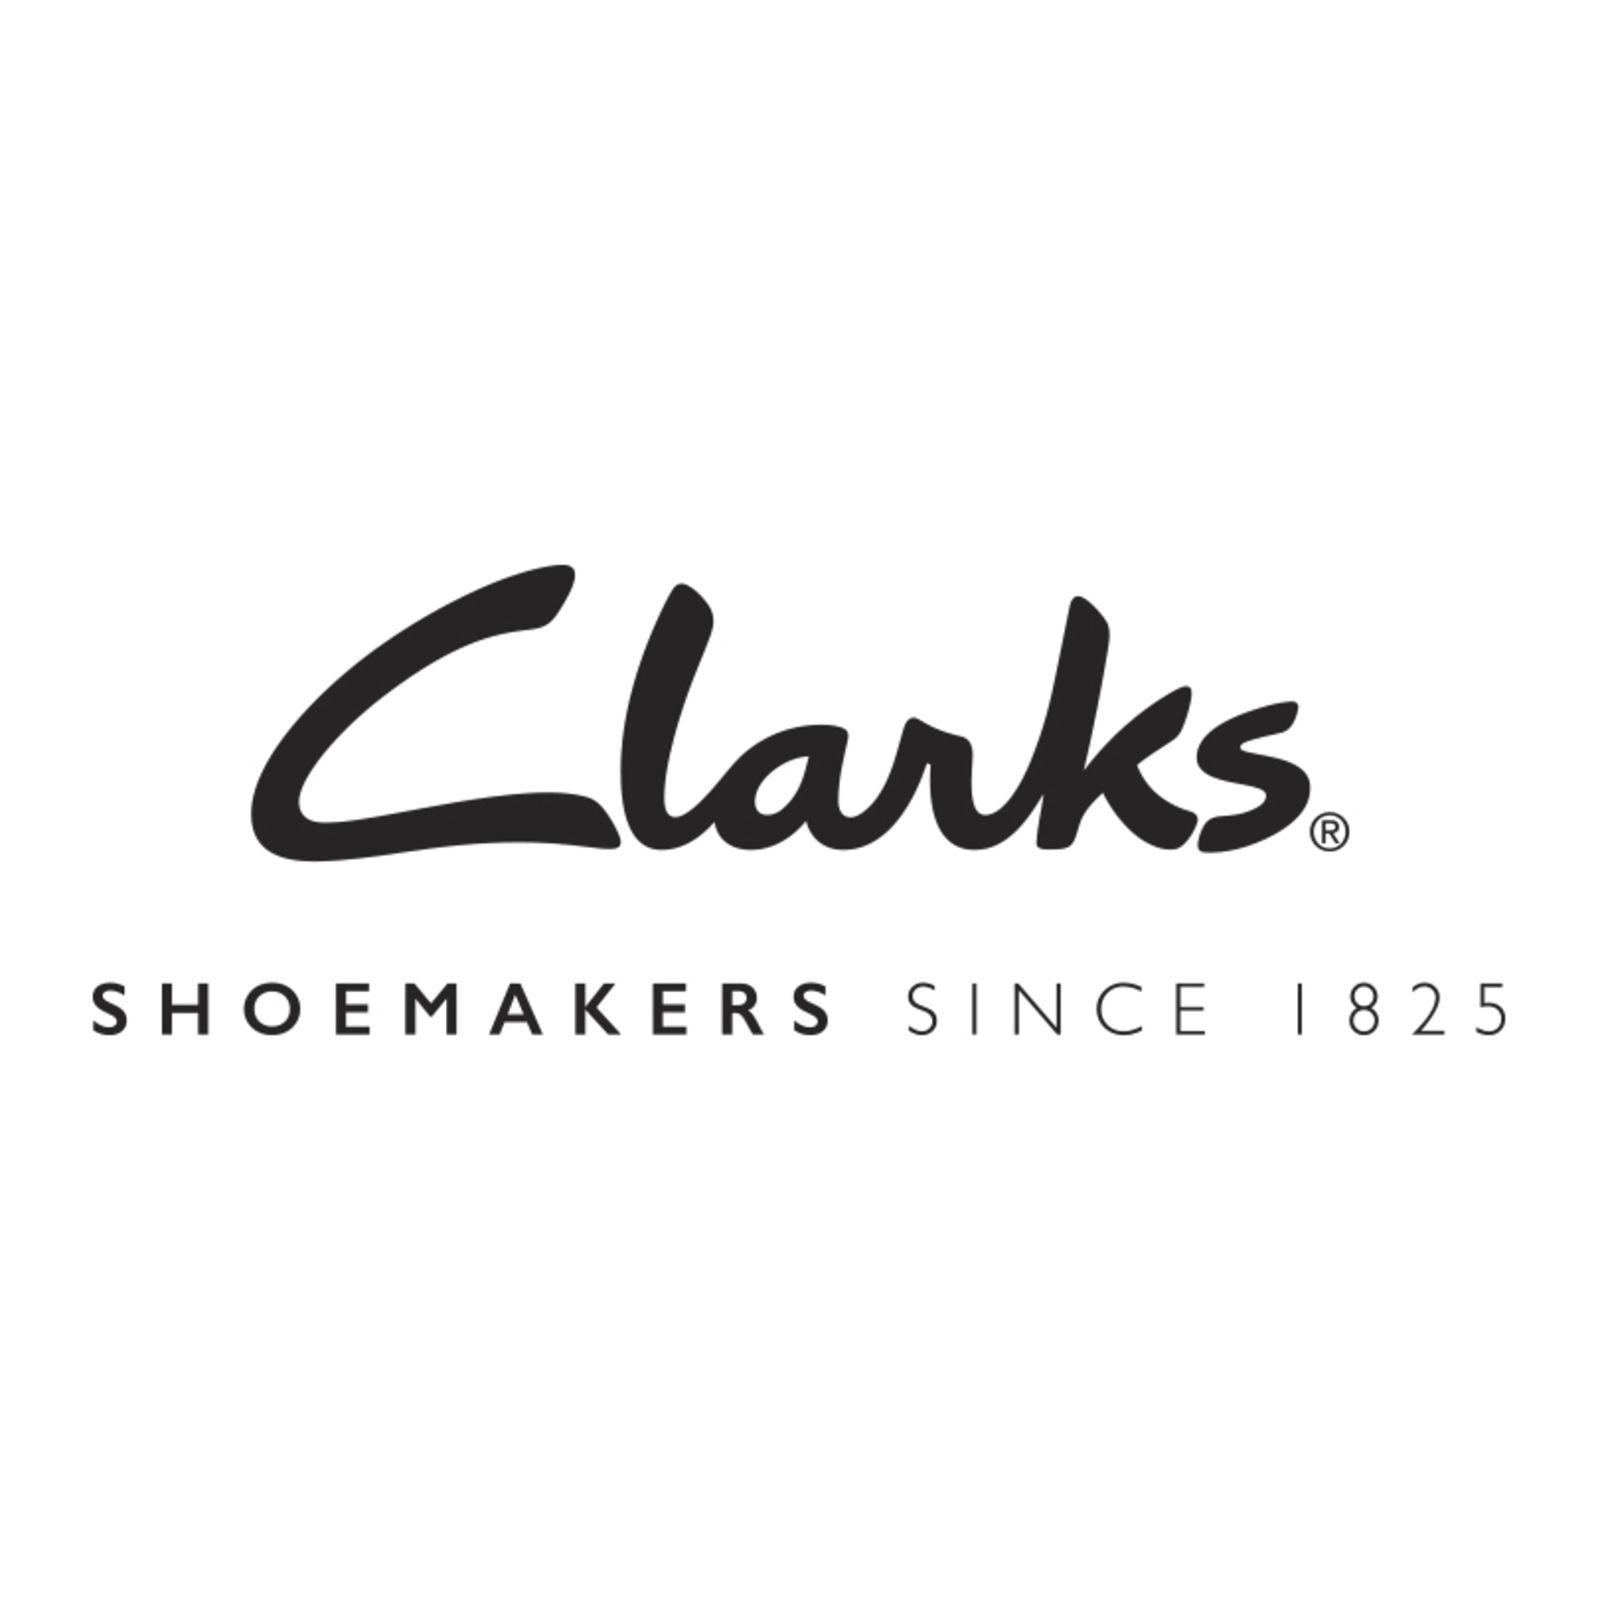 Clarks (Image 1)